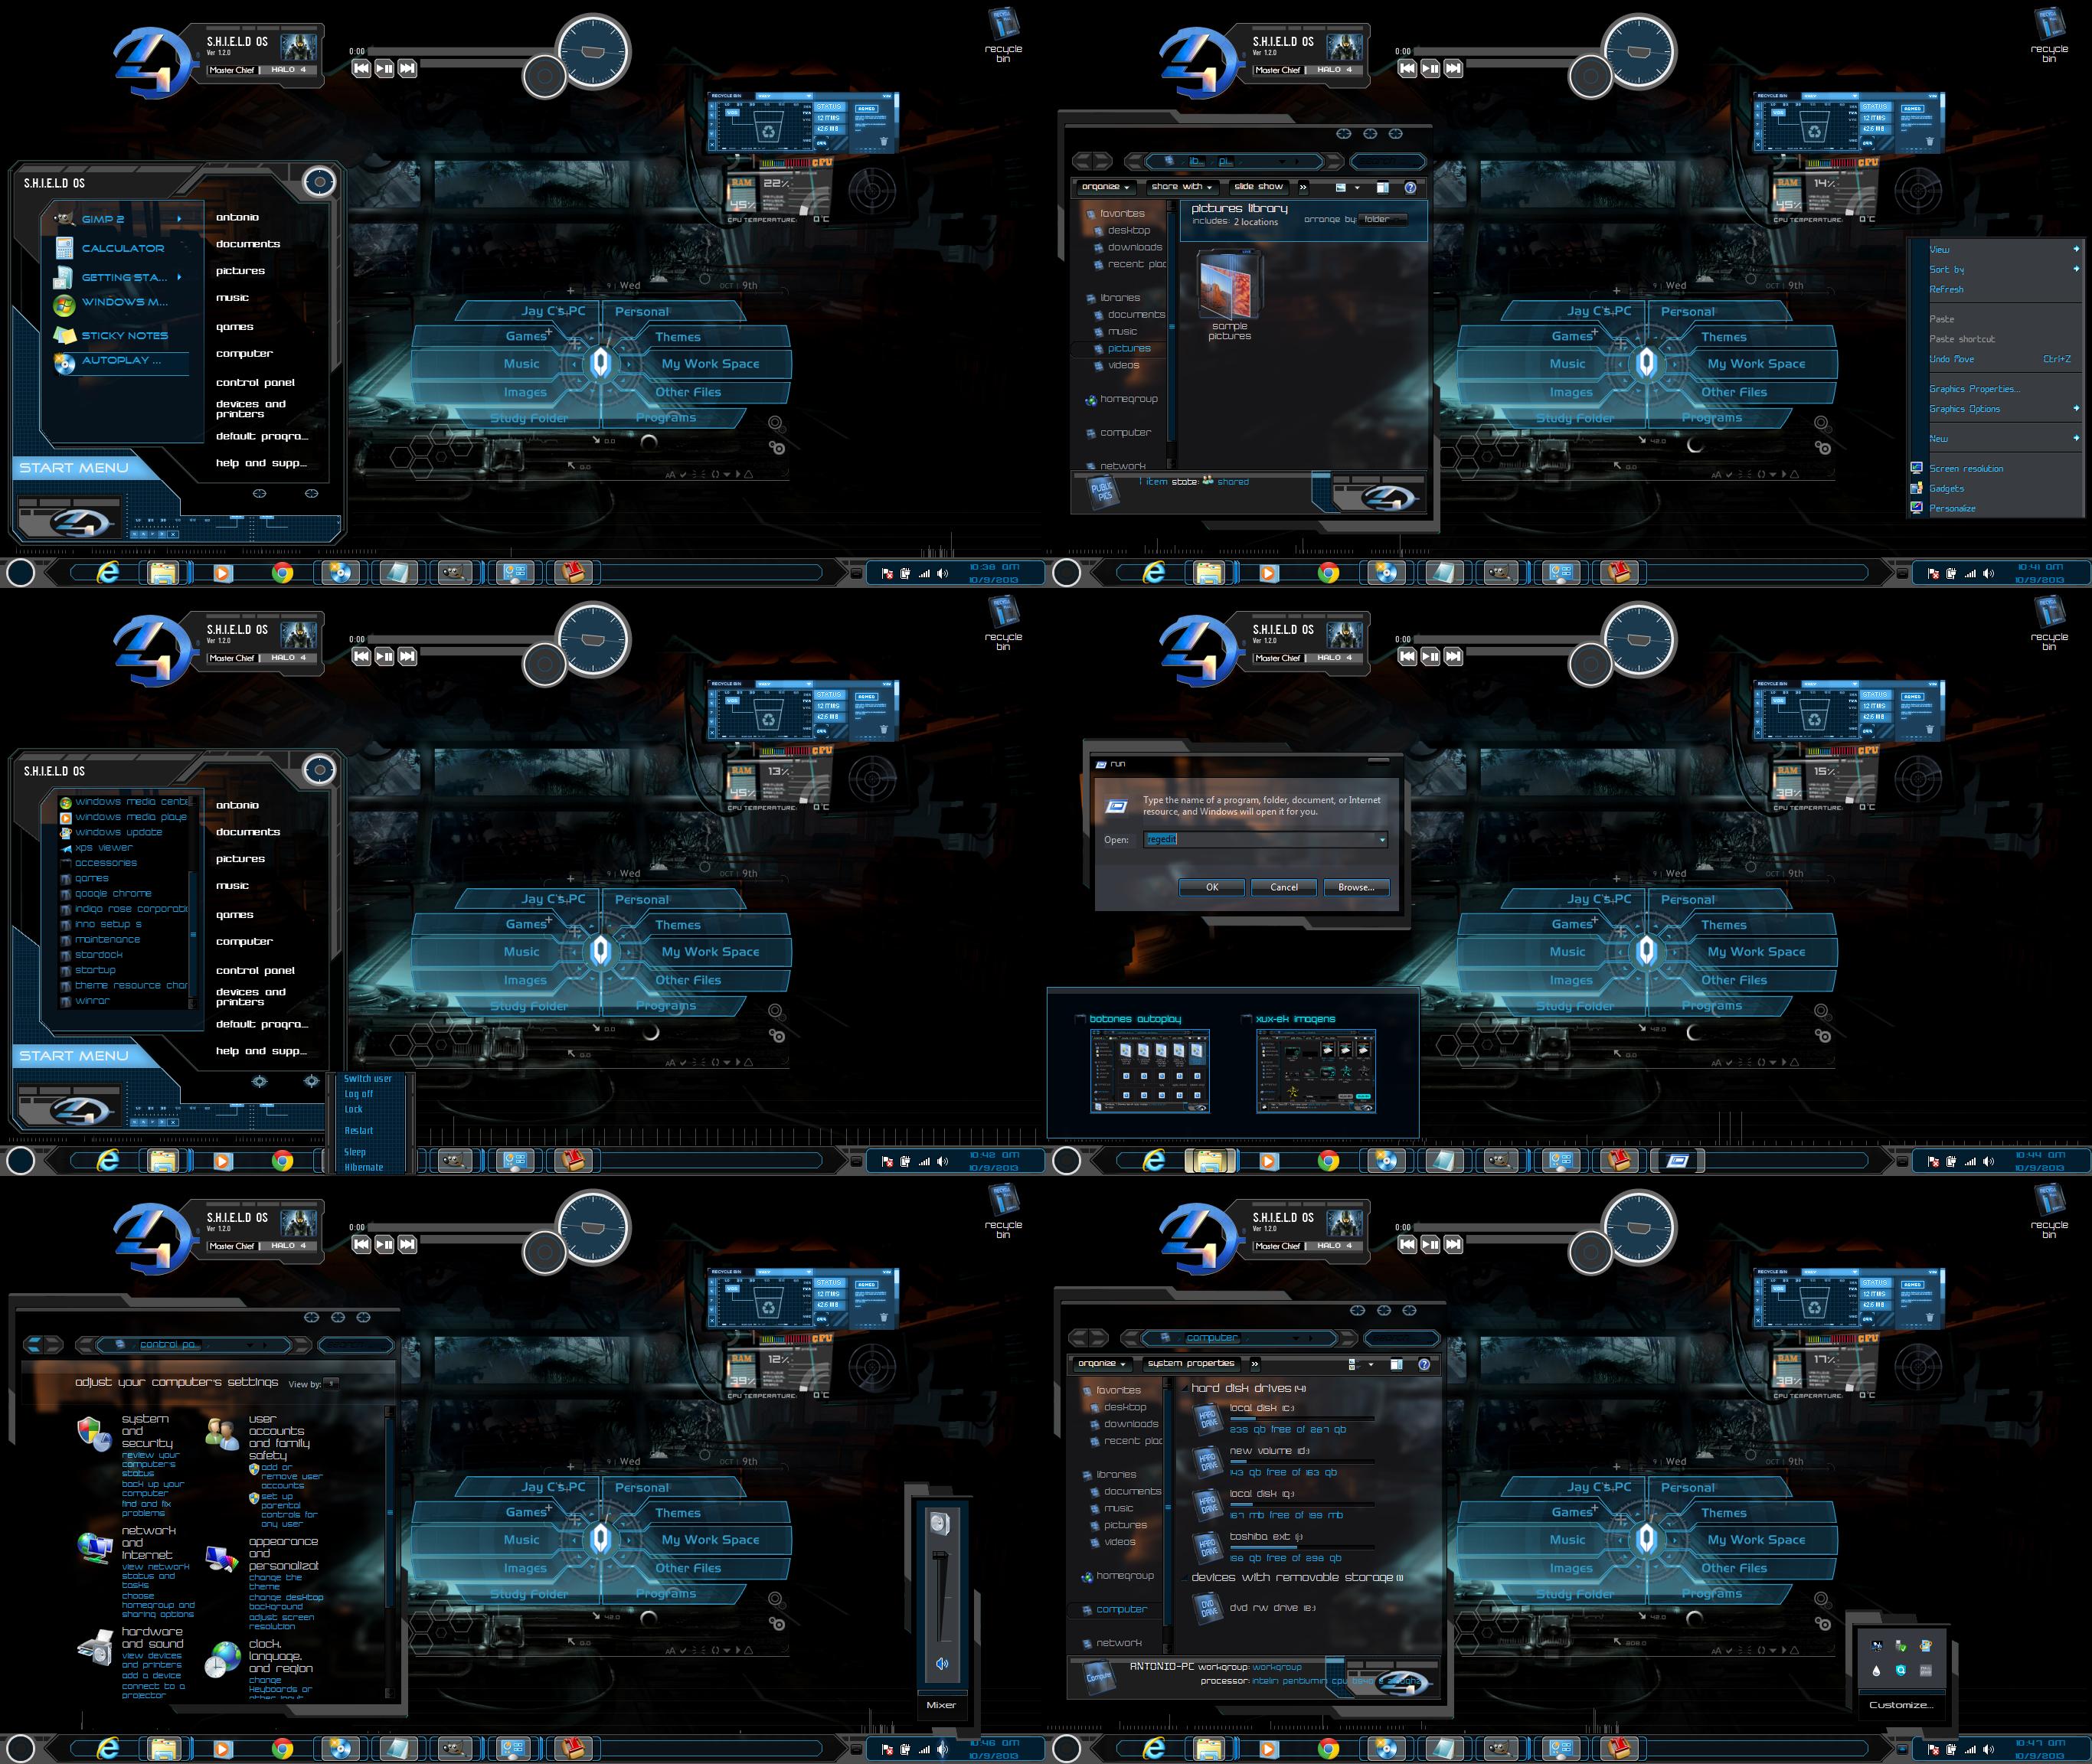 Windows 7 themes dark shields by tono3022 on deviantart for Window 07 themes